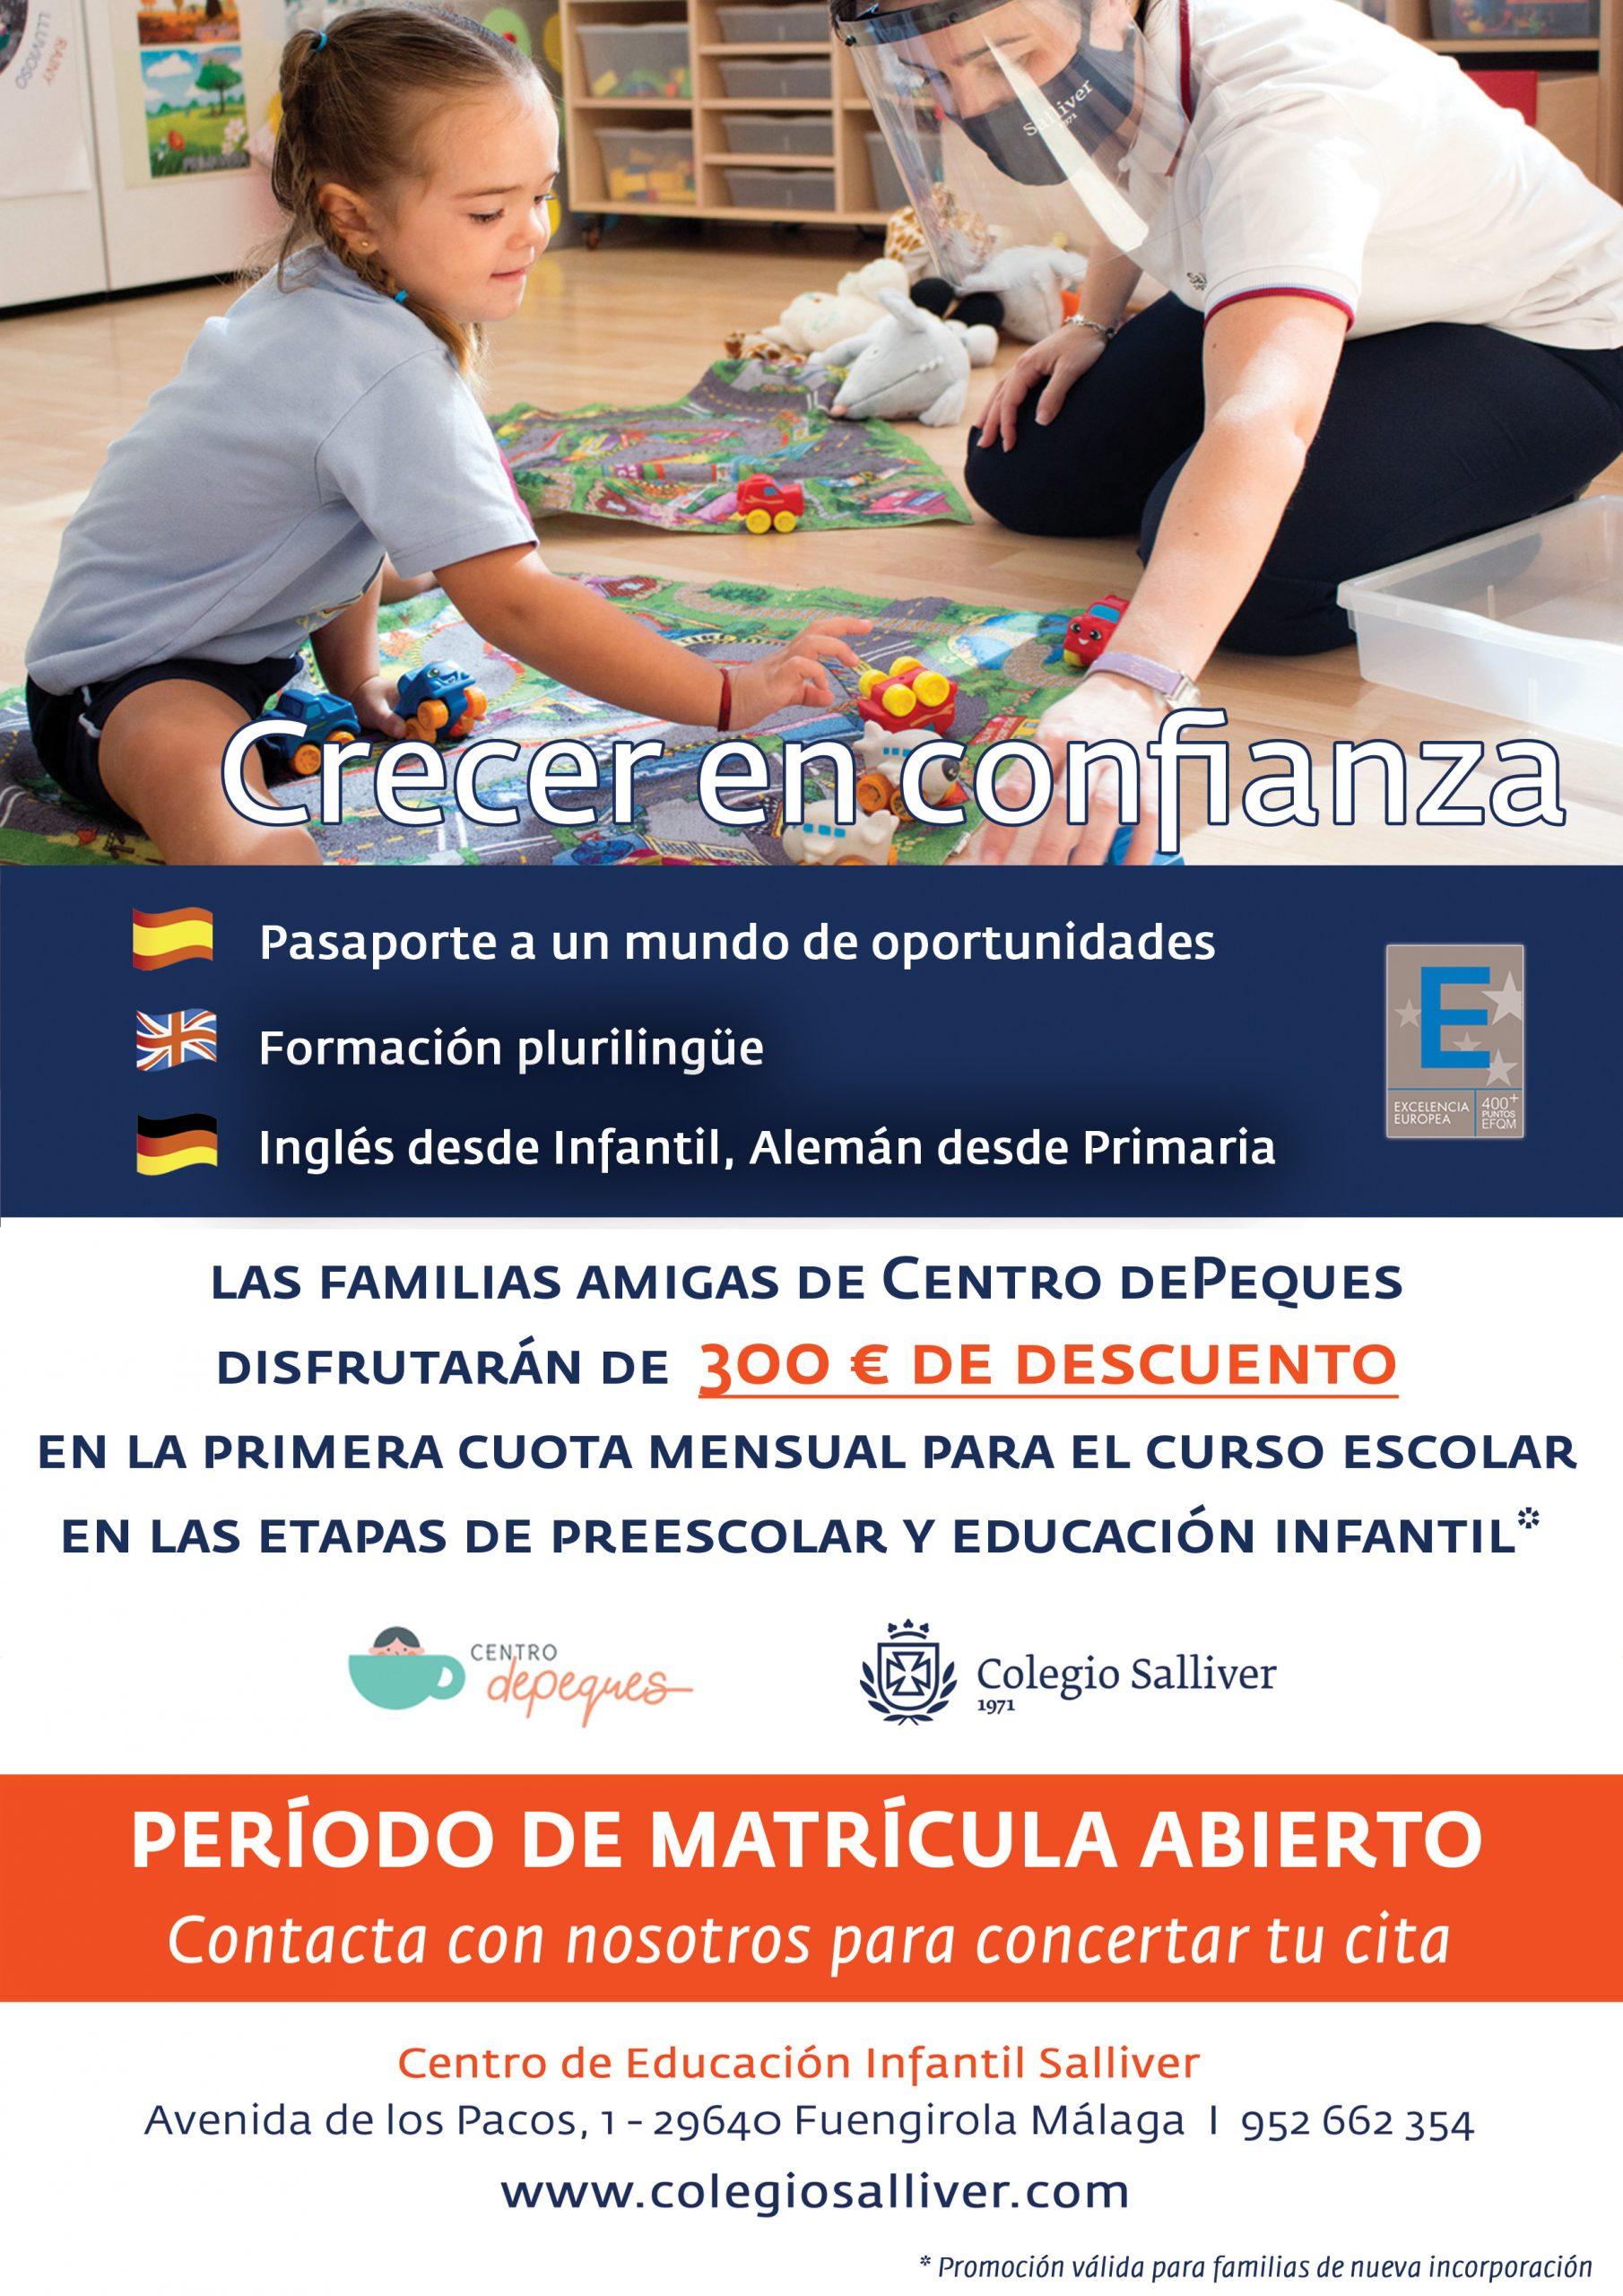 folleto-descuento-promocion-depeques-2020_21-colegio-salliver-03